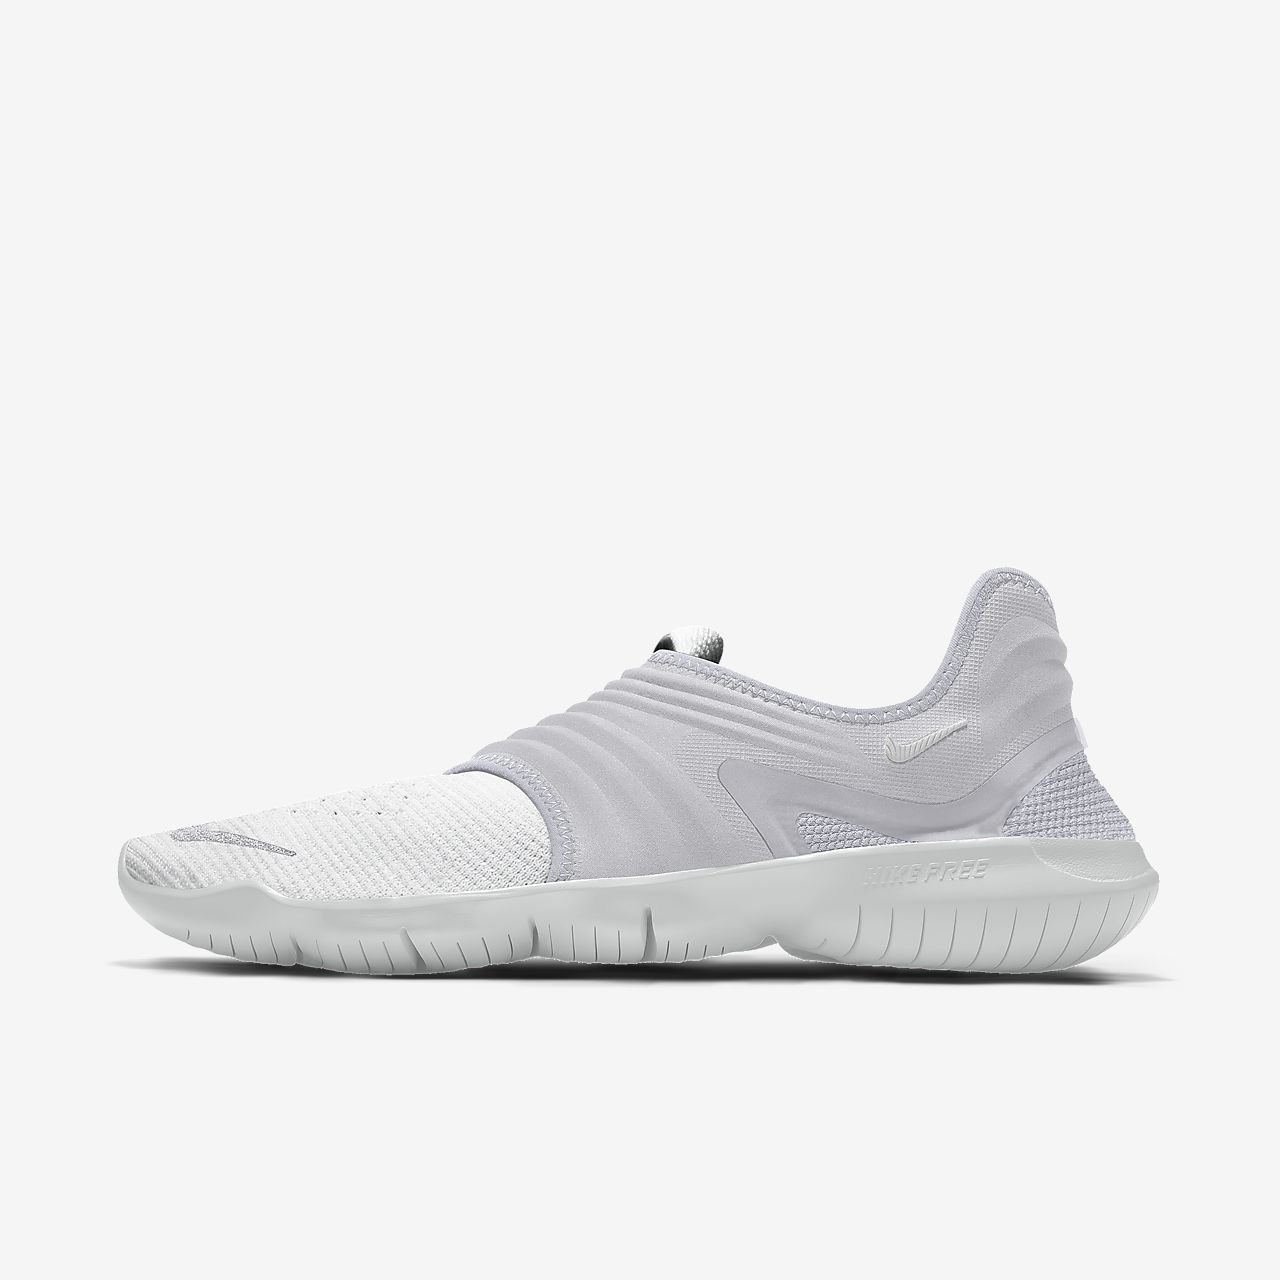 Nike Free RN Flyknit 3.0 By You tilpassede løpesko til dame